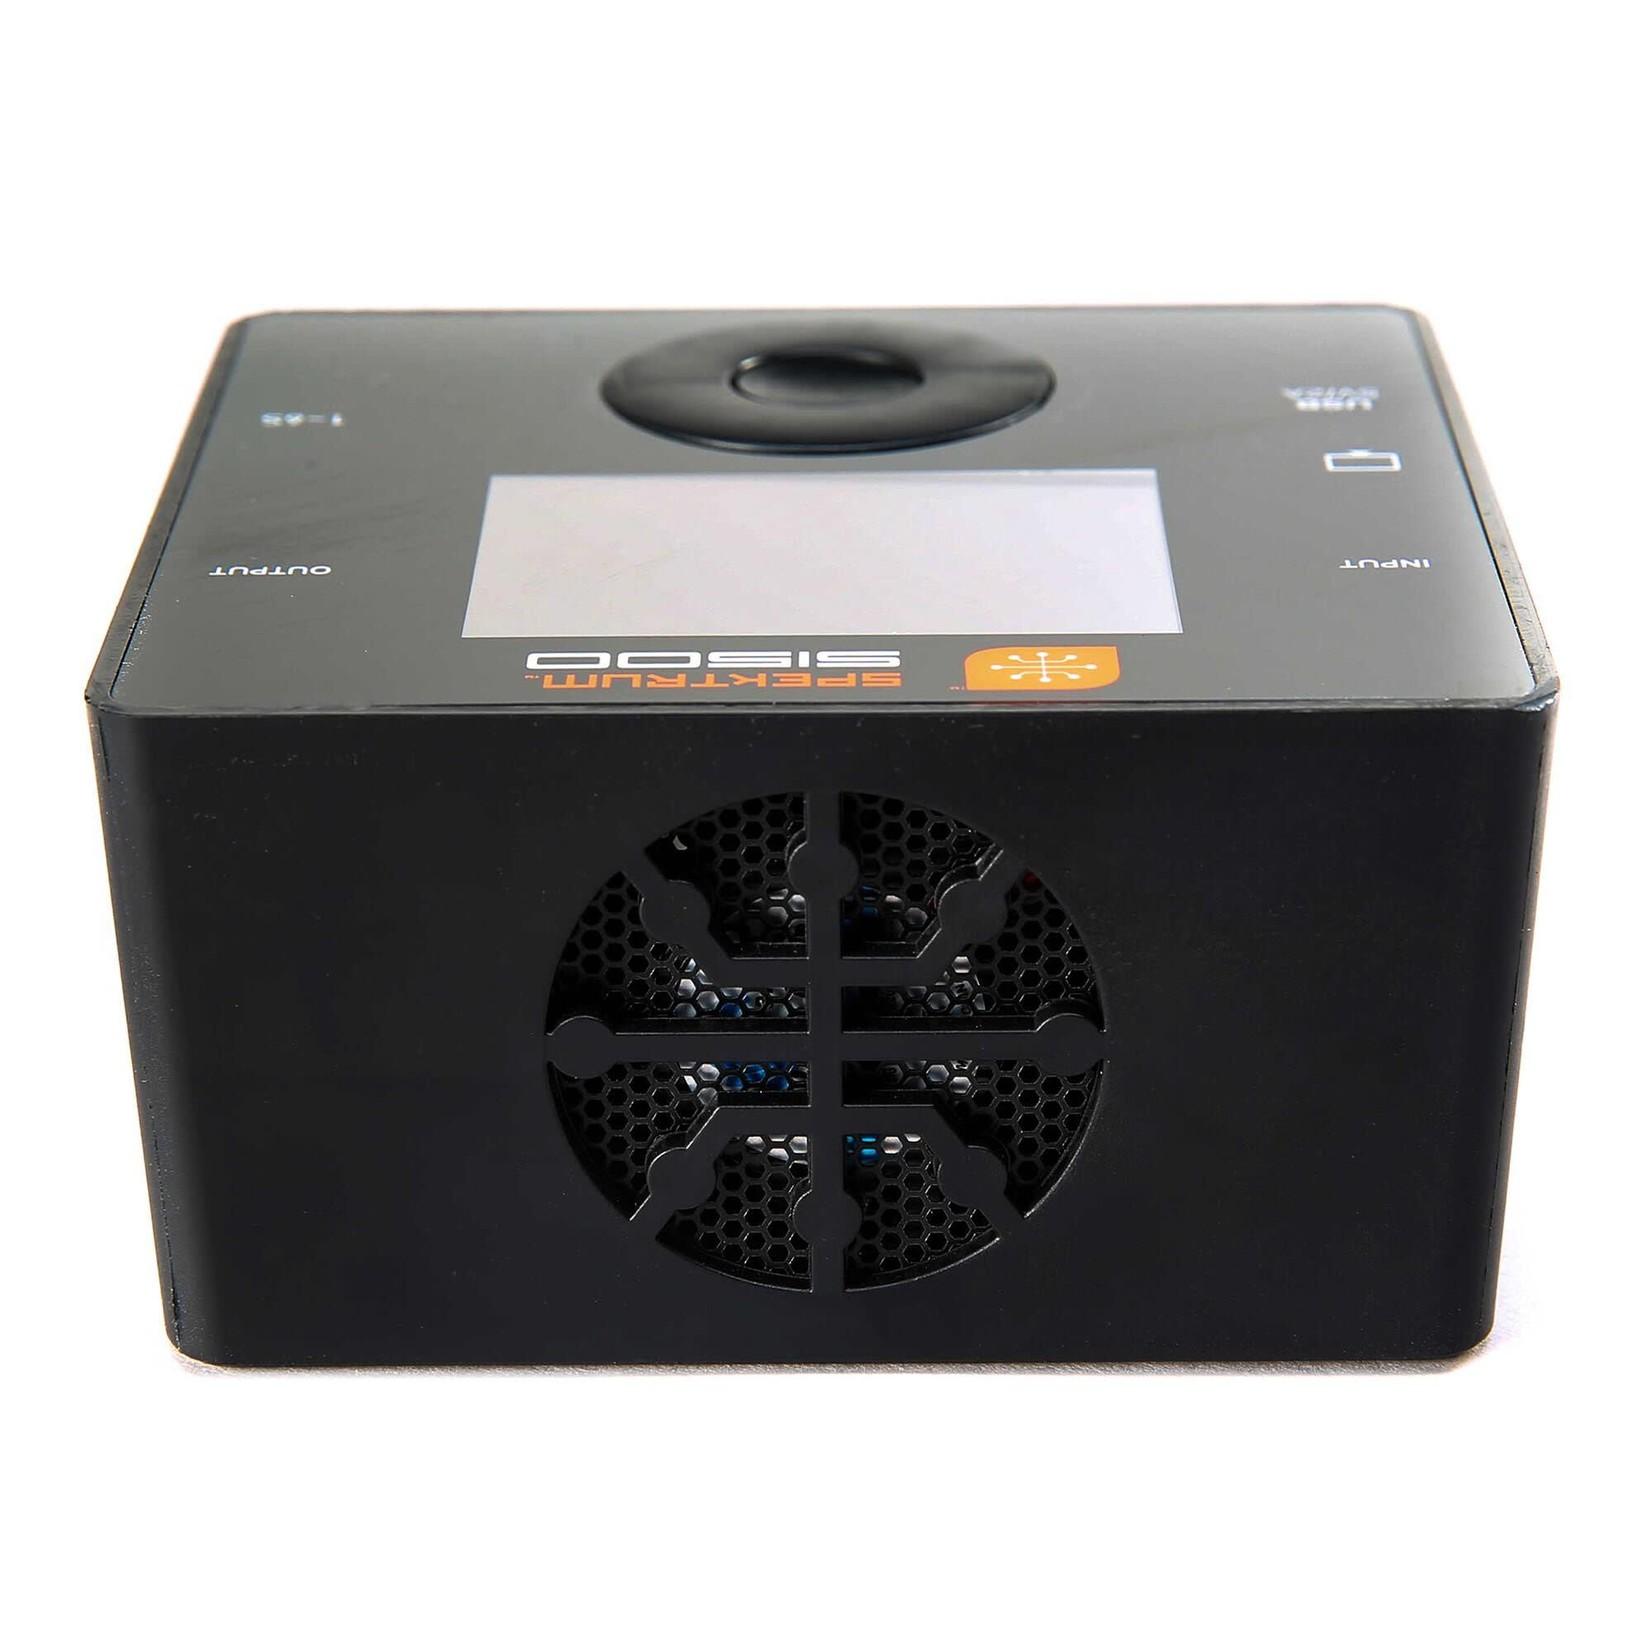 Spektrum SPMXC1050 Spektrum Smart S1500 DC Charger, 1x500W